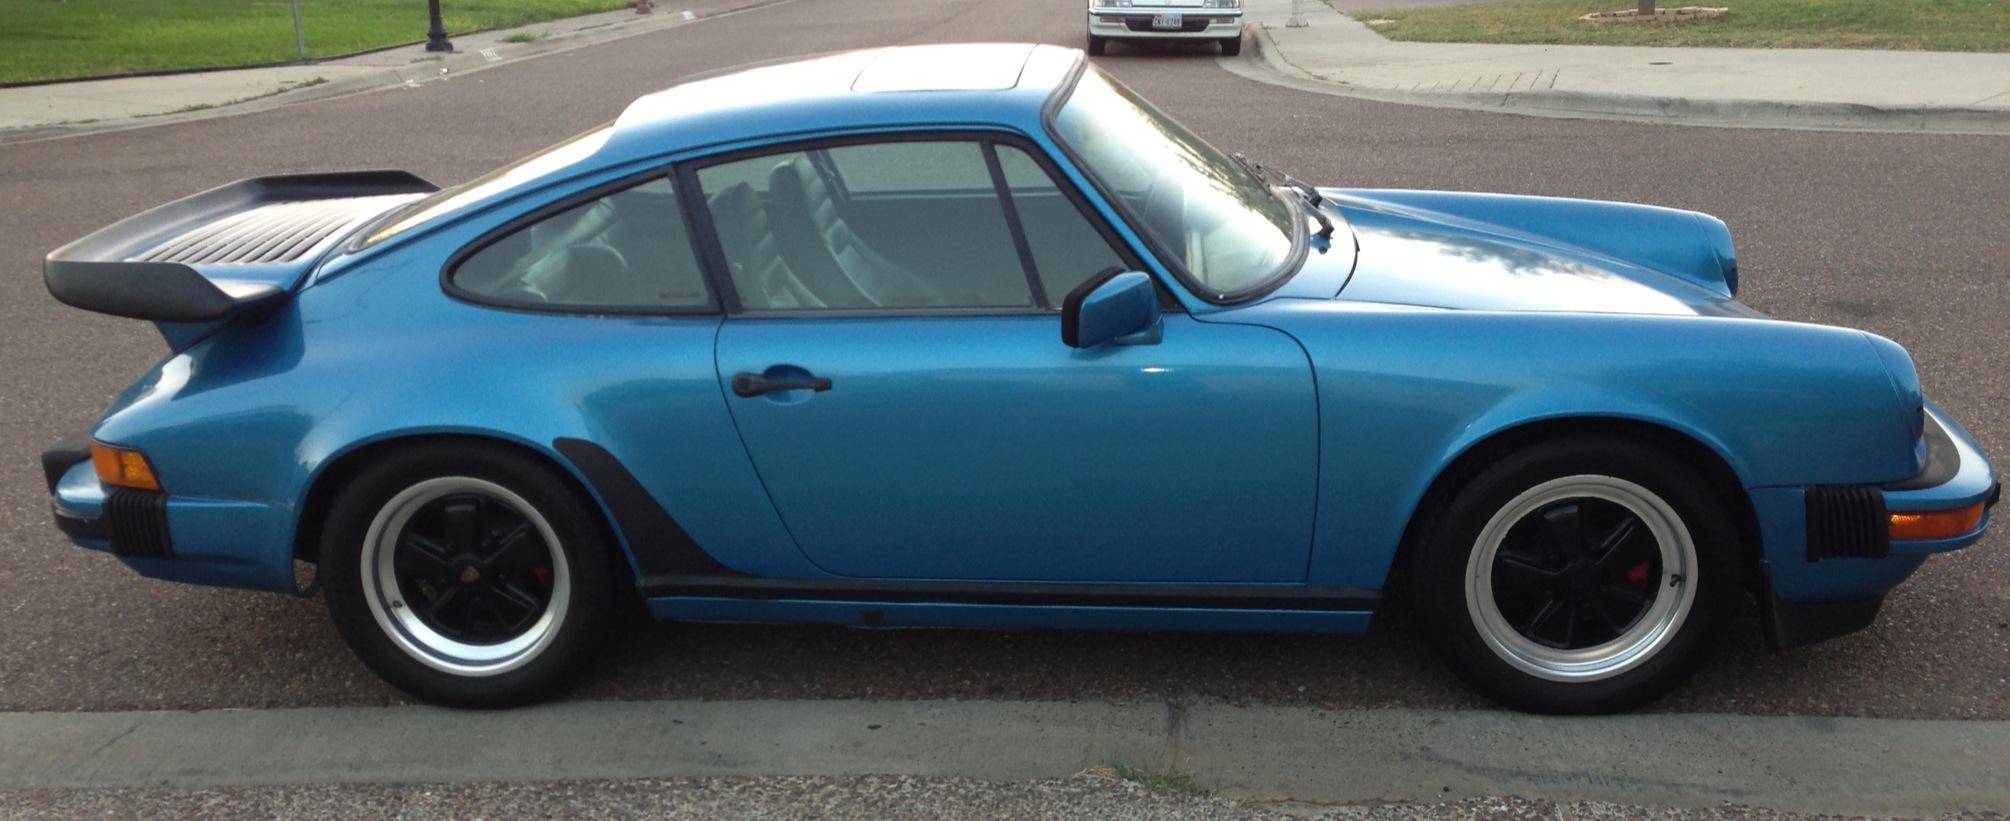 Two Classic 1978 Porsche 911 Sc Up For Sale In Laredo